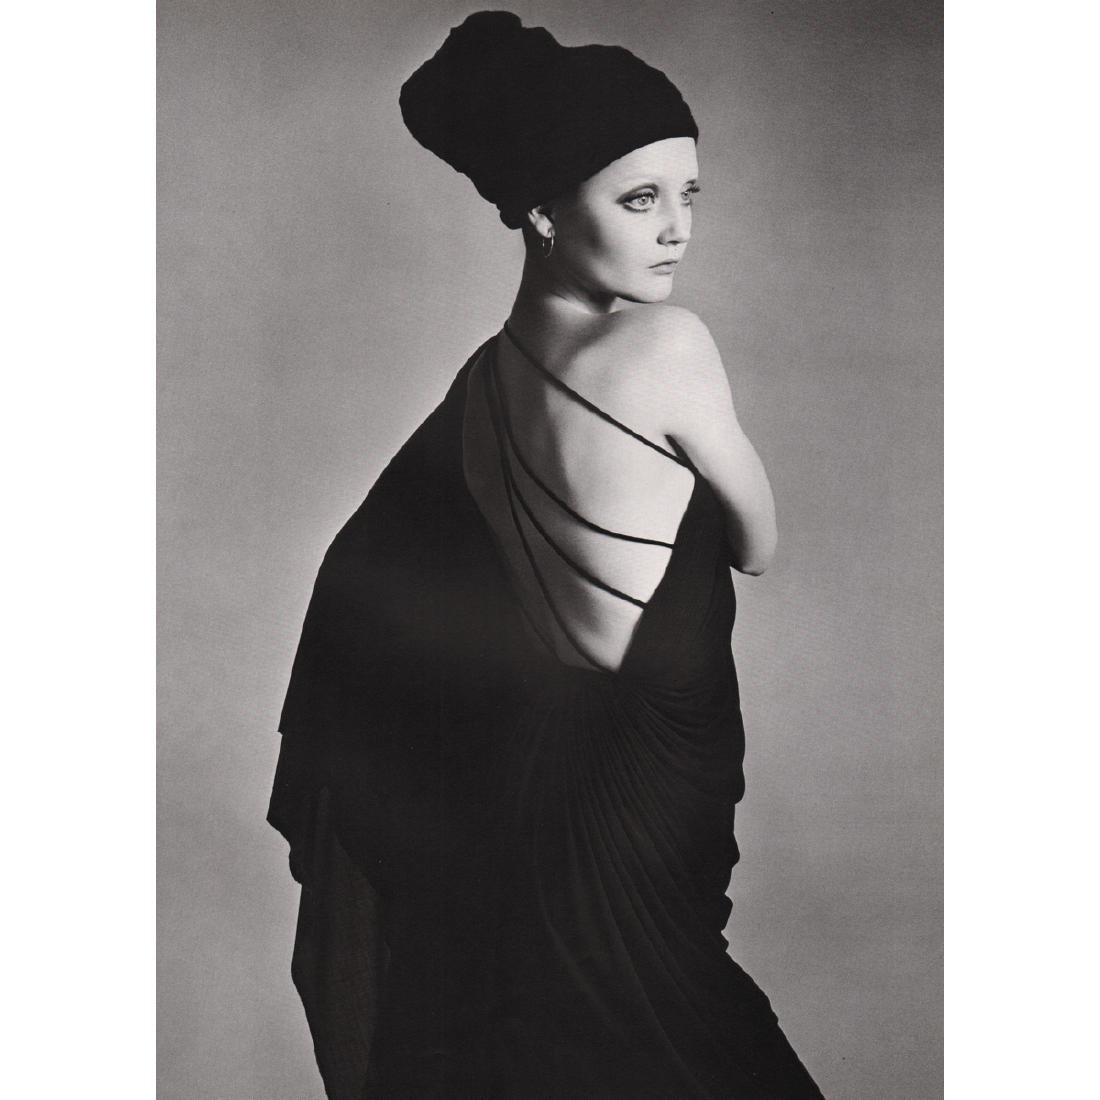 RICHARD AVEDON - Ingrid Boulting, 1970